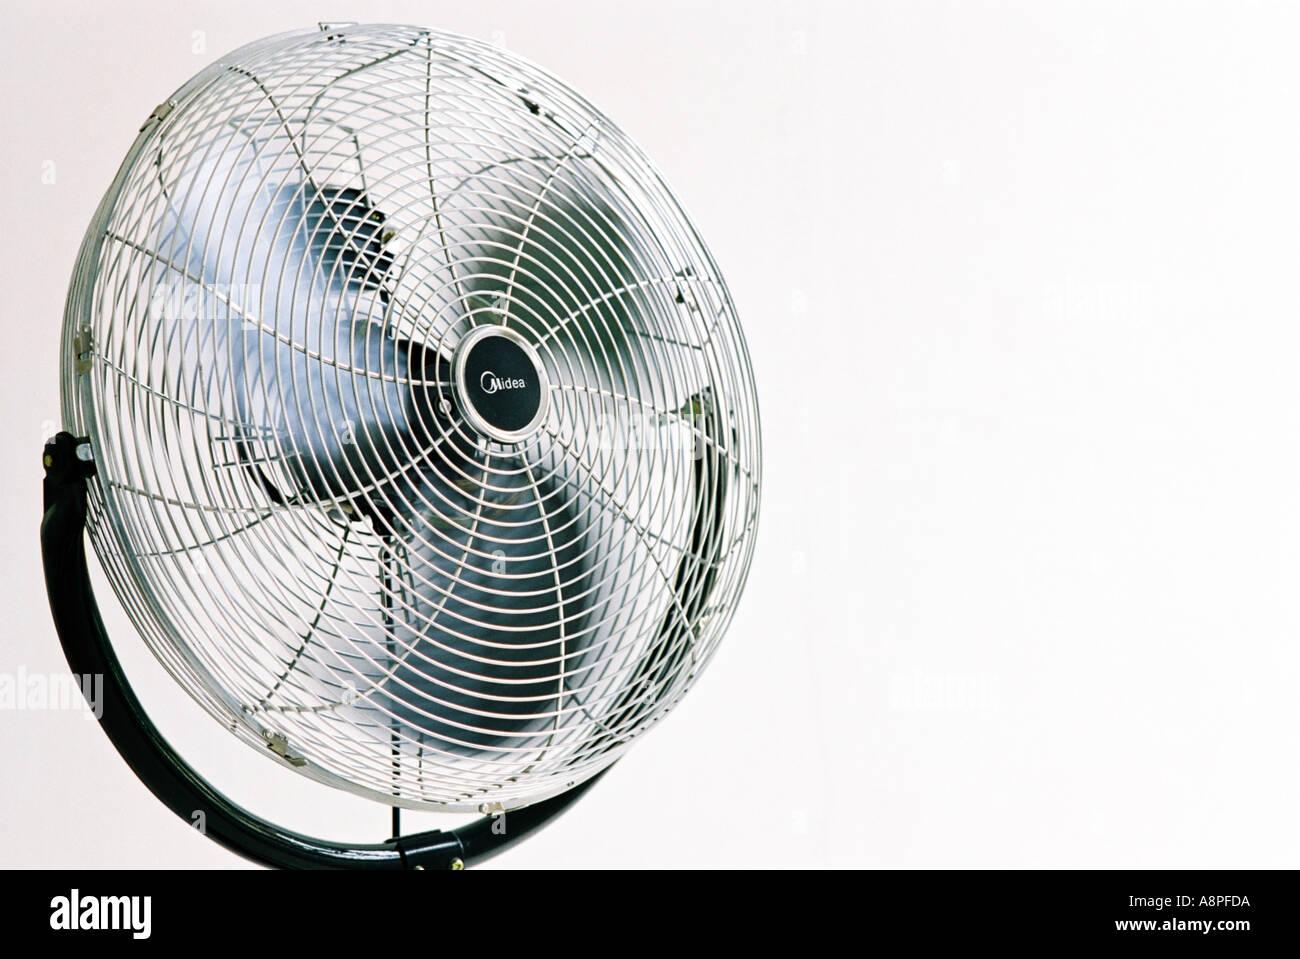 ventilators stockfotos ventilators bilder seite 3 alamy. Black Bedroom Furniture Sets. Home Design Ideas